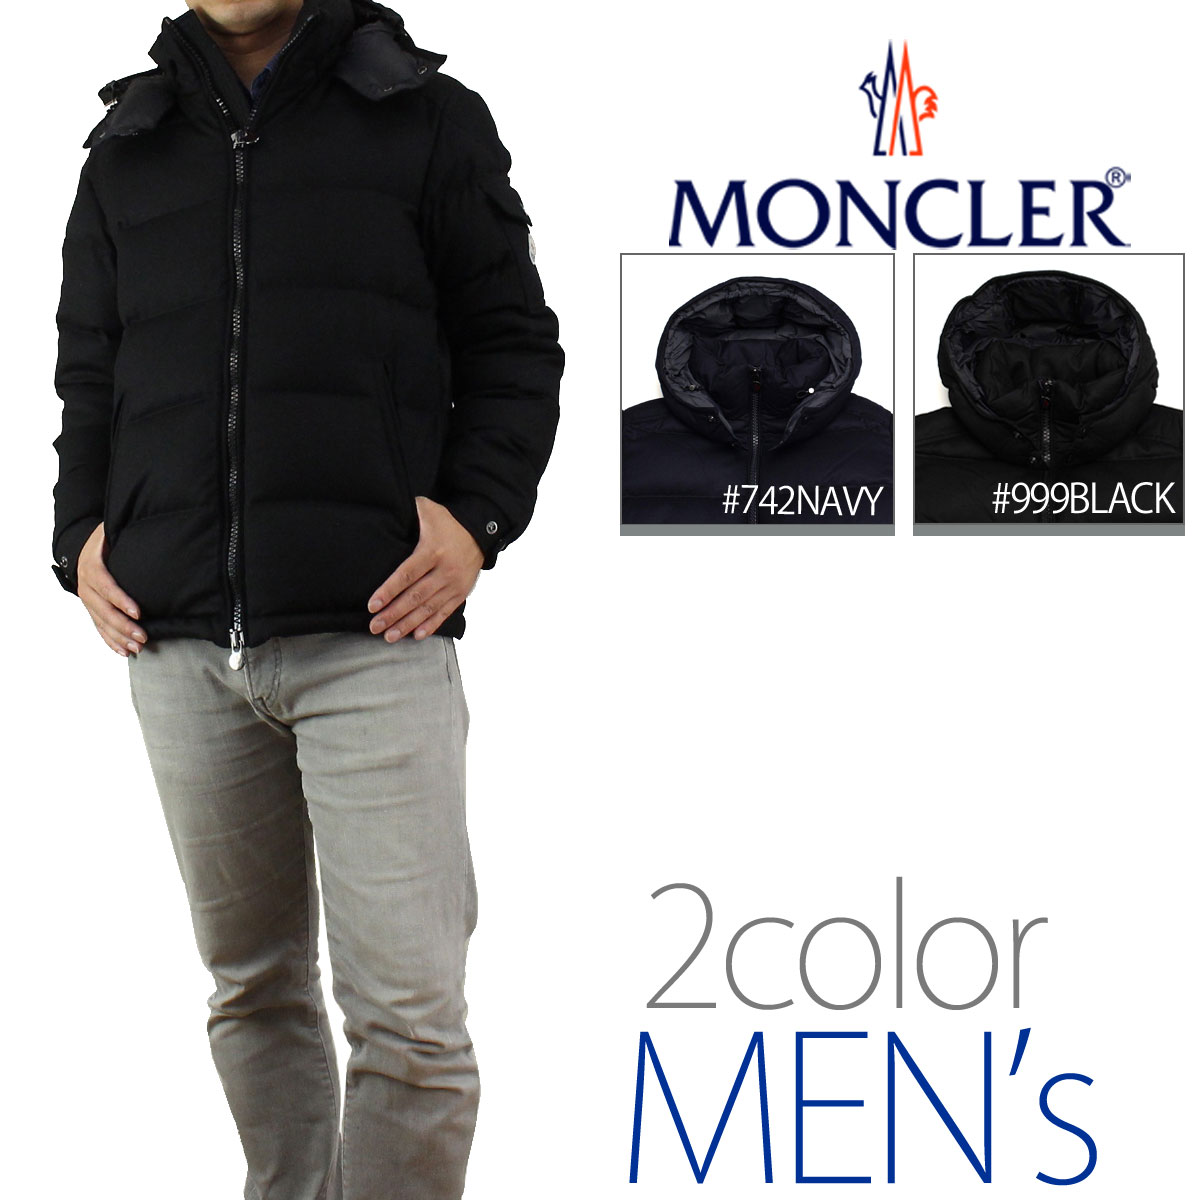 moncler montgenevre black